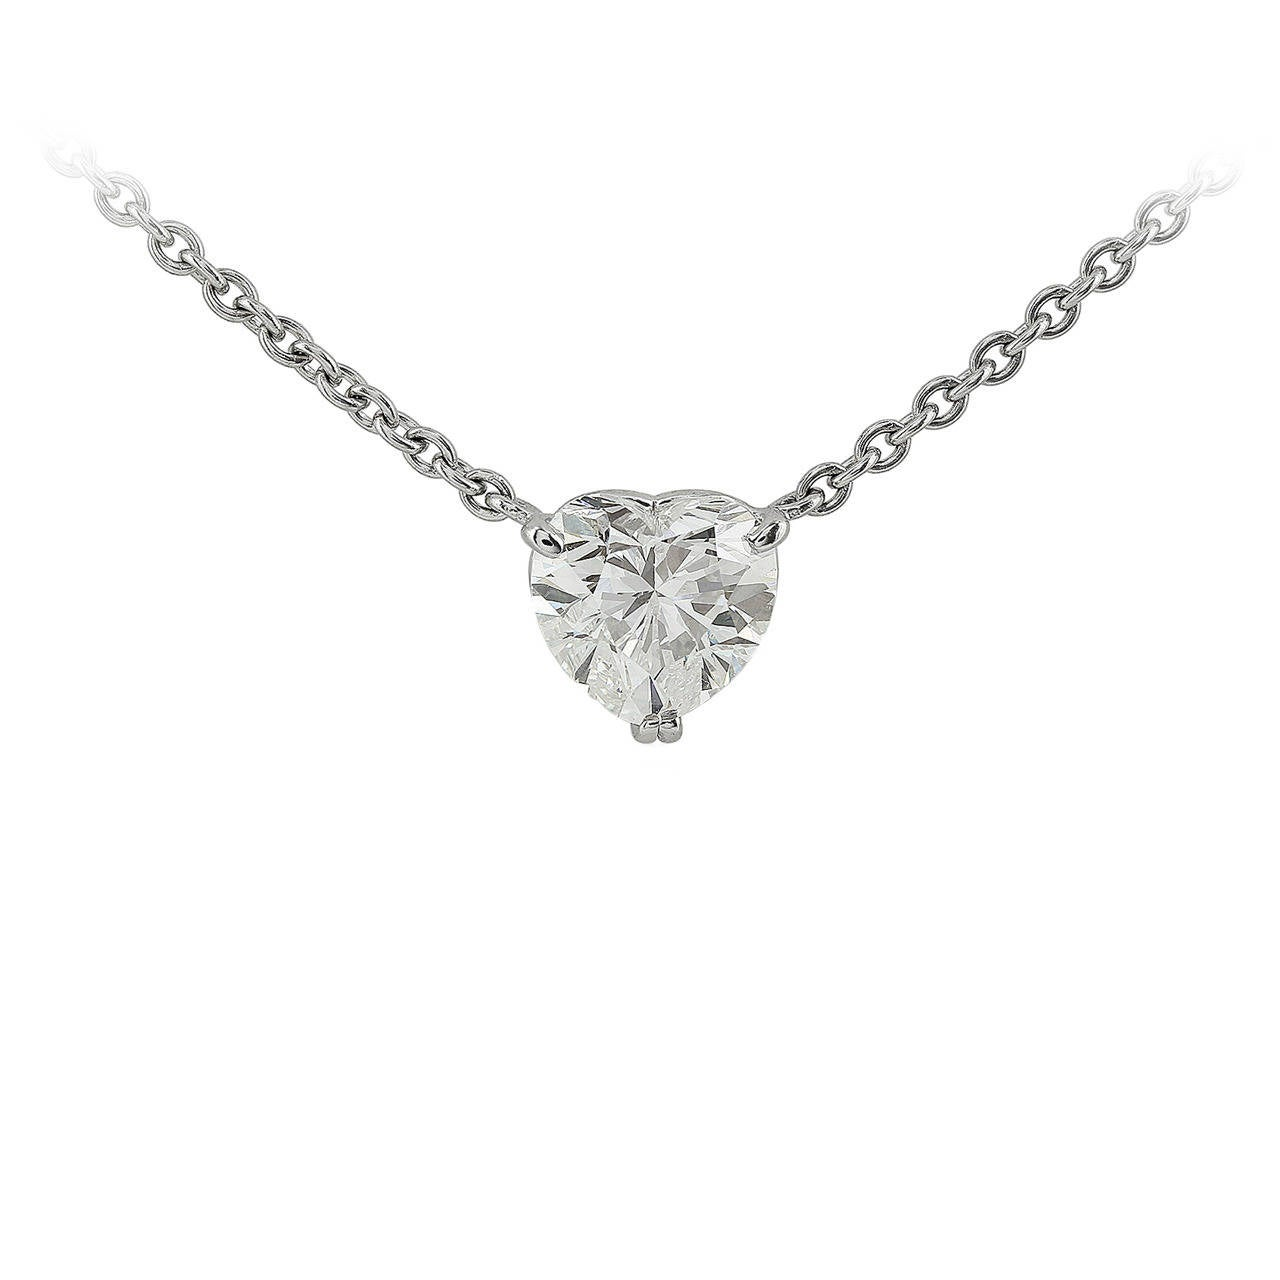 1.89 Carat Heart Diamond Platinum Pendant For Sale